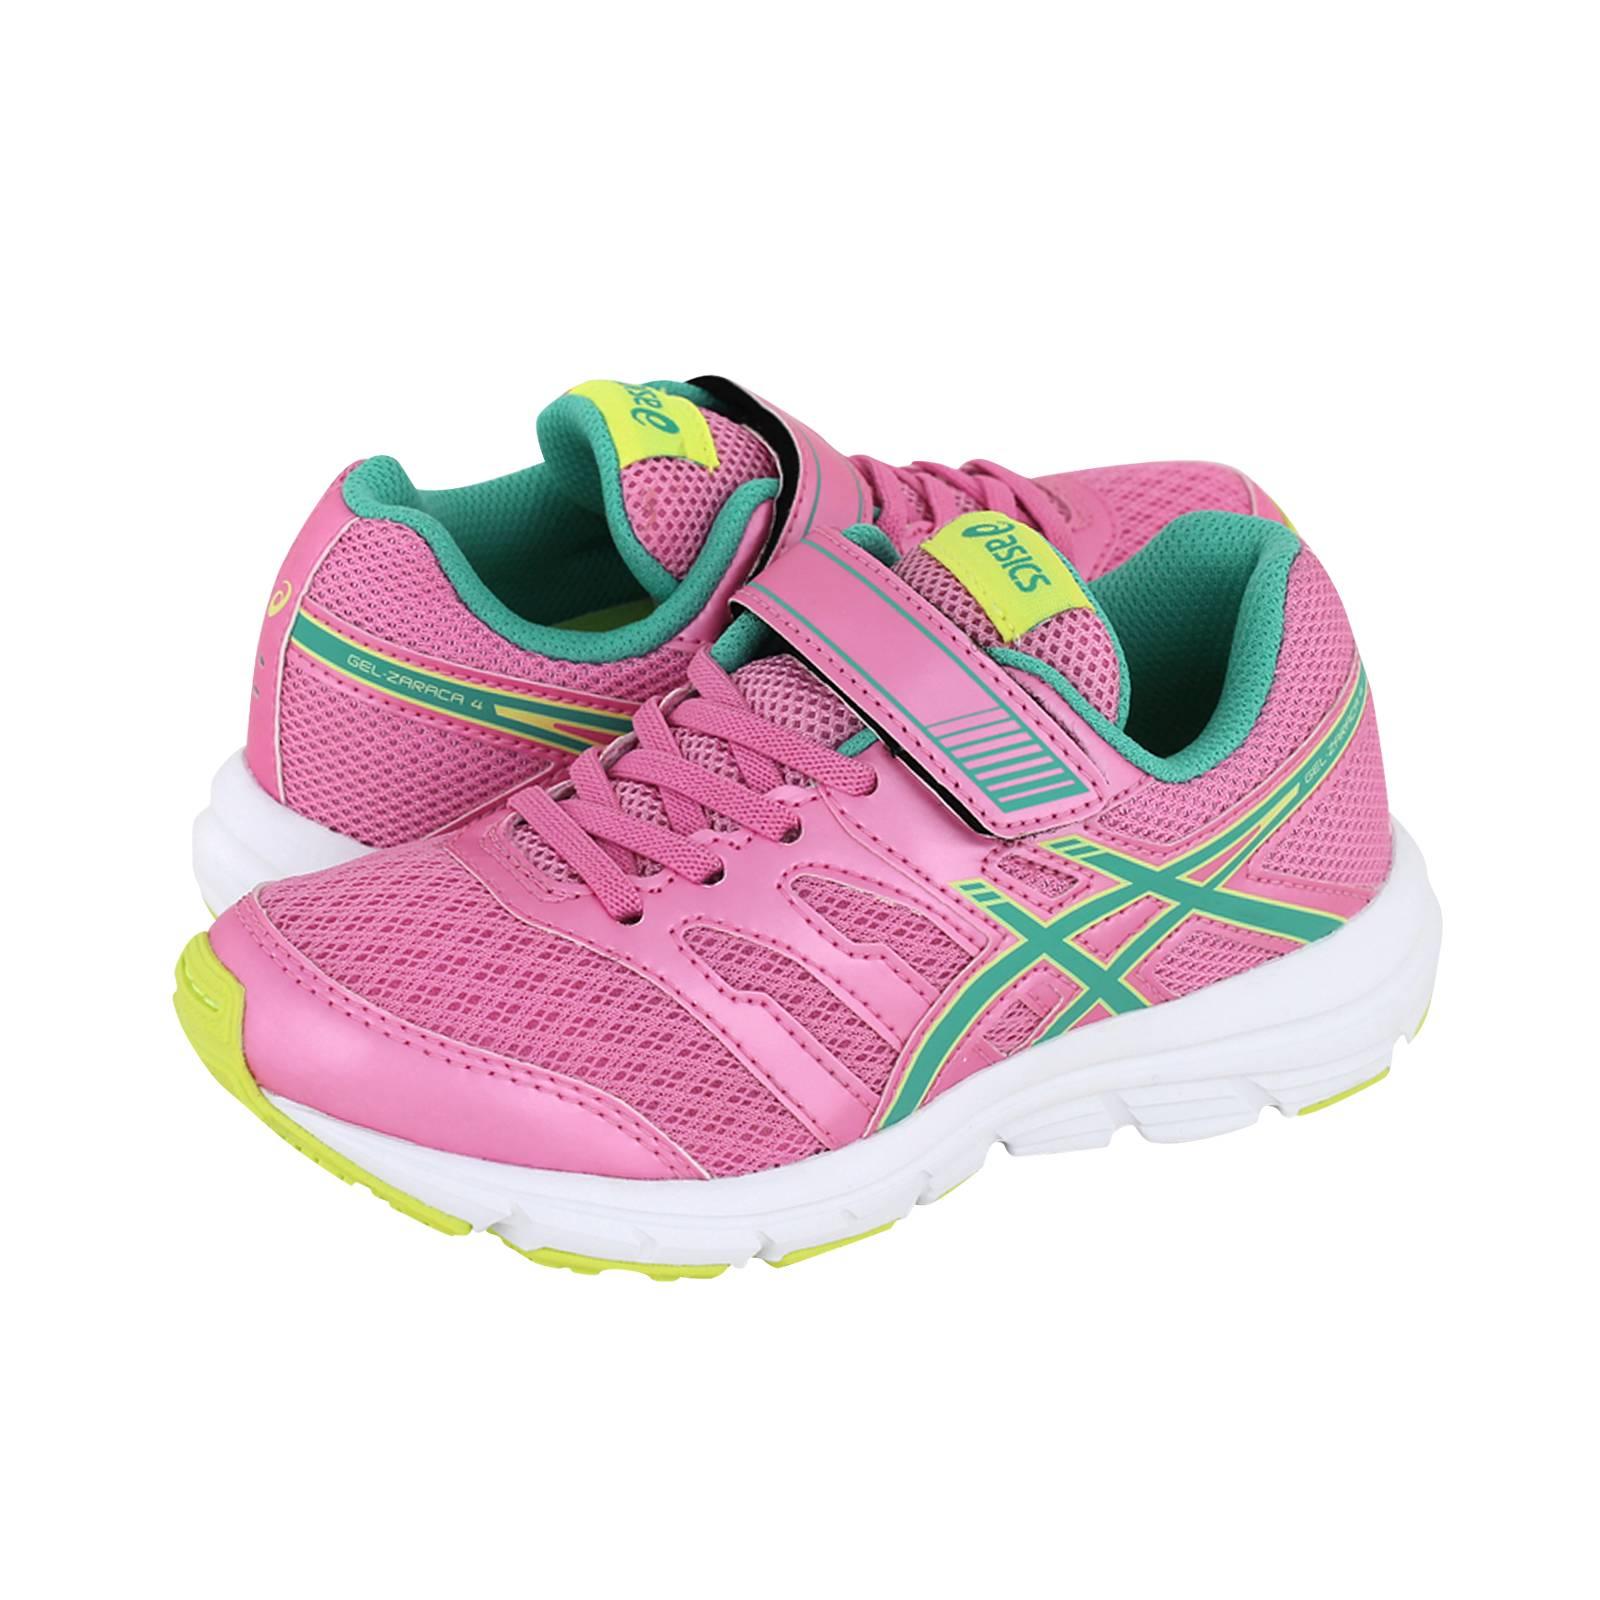 c3db8cca9f2 Αθλητικά Παιδικά Παπούτσια Asics Gel-Zaraca 4 PS